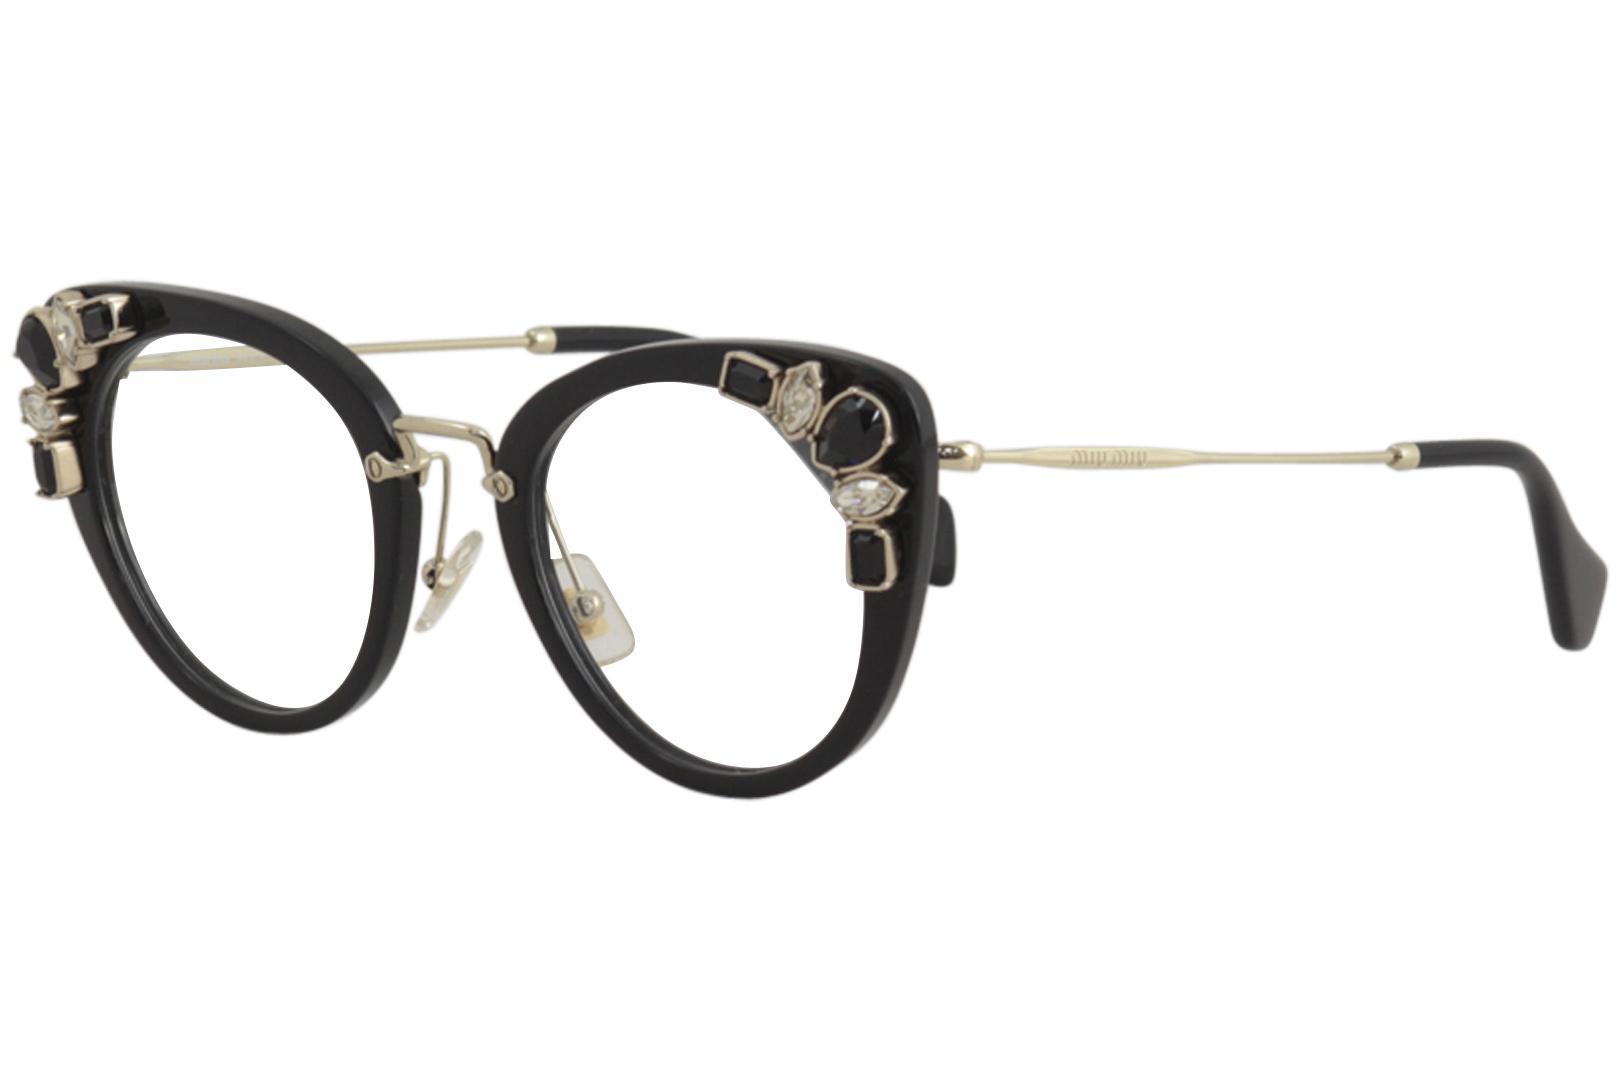 Miu Miu Women\'s Eyeglasses VMU05P VMU/05P Full Rim Optical Frame